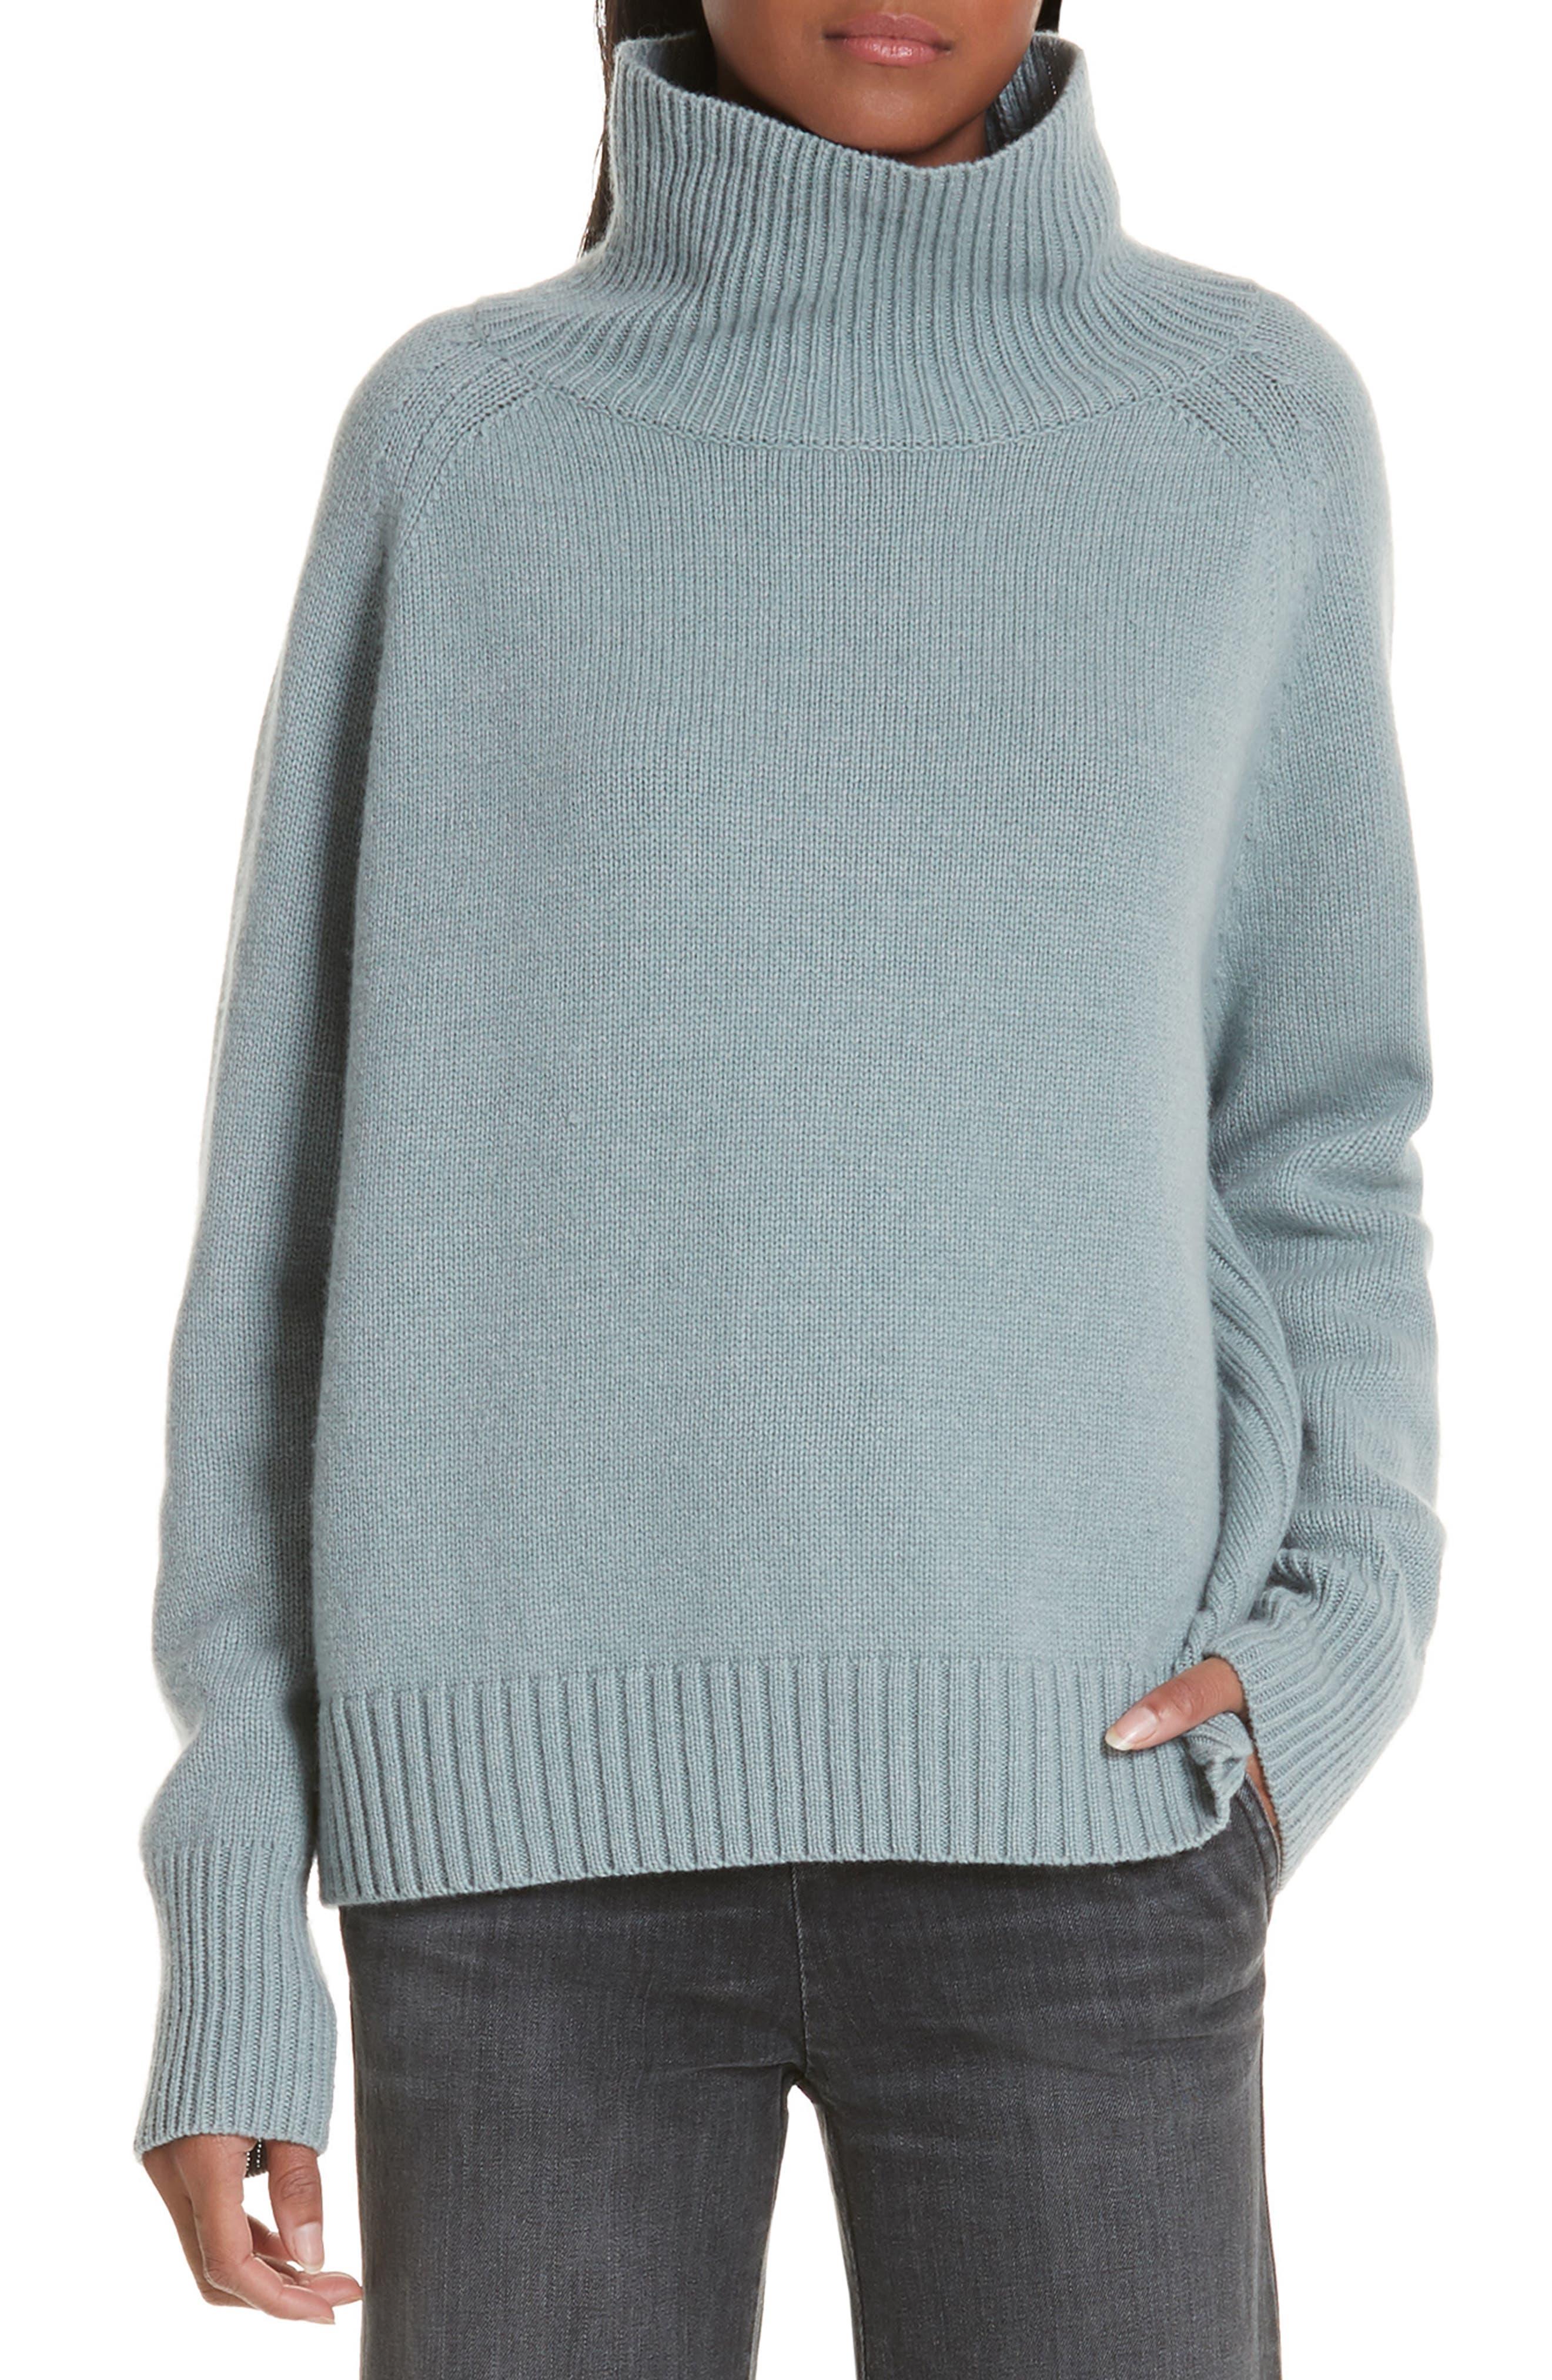 NILI LOTAN Mariah Funnel Neck Cashmere Sweater, Main, color, SKY BLUE